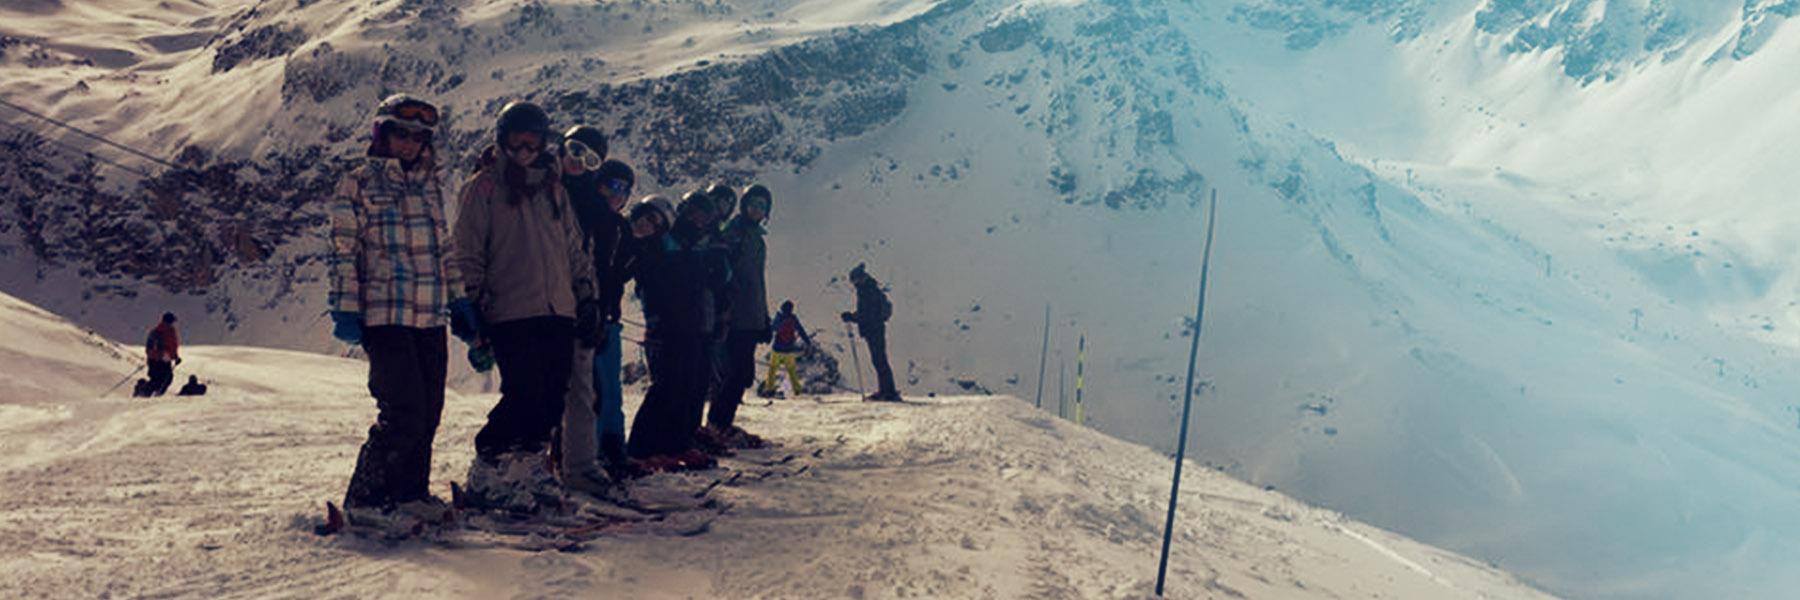 skihomepages_0004_Turquoise Haze